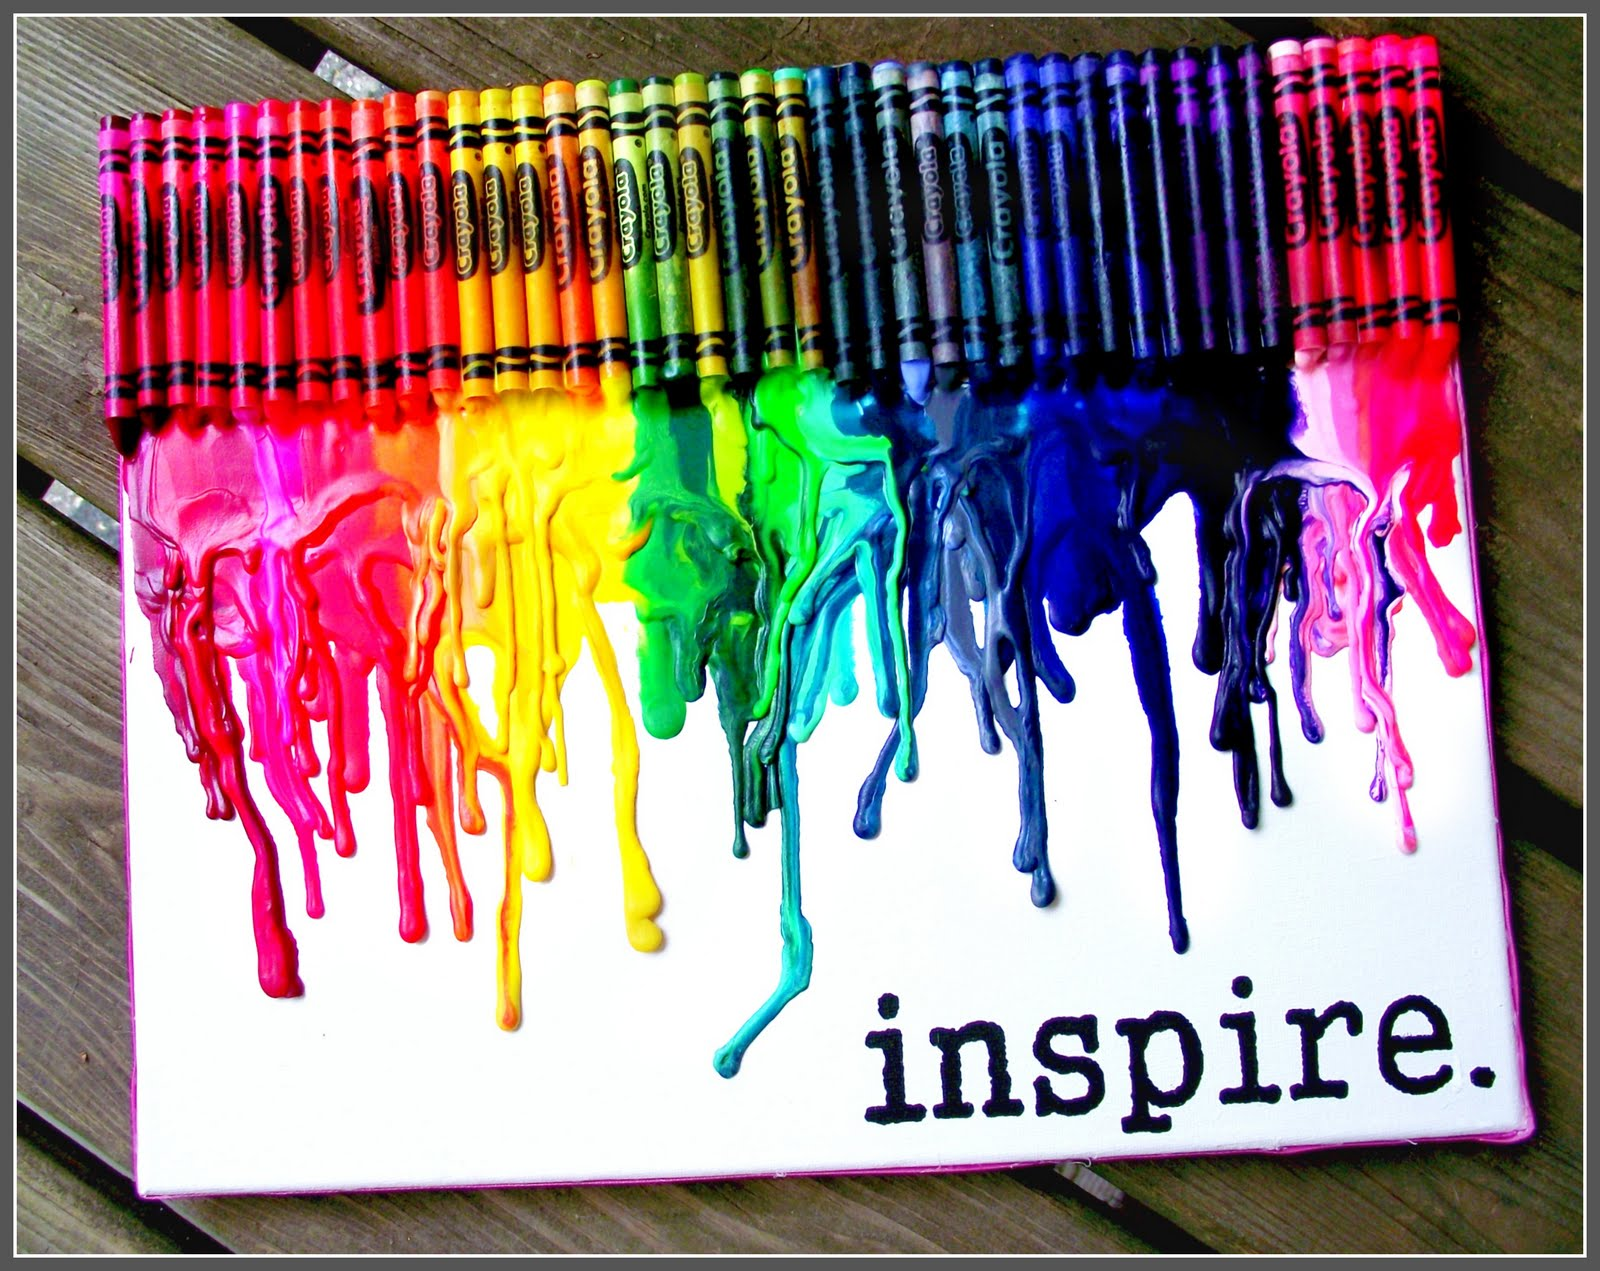 wingledings melted crayon wall art